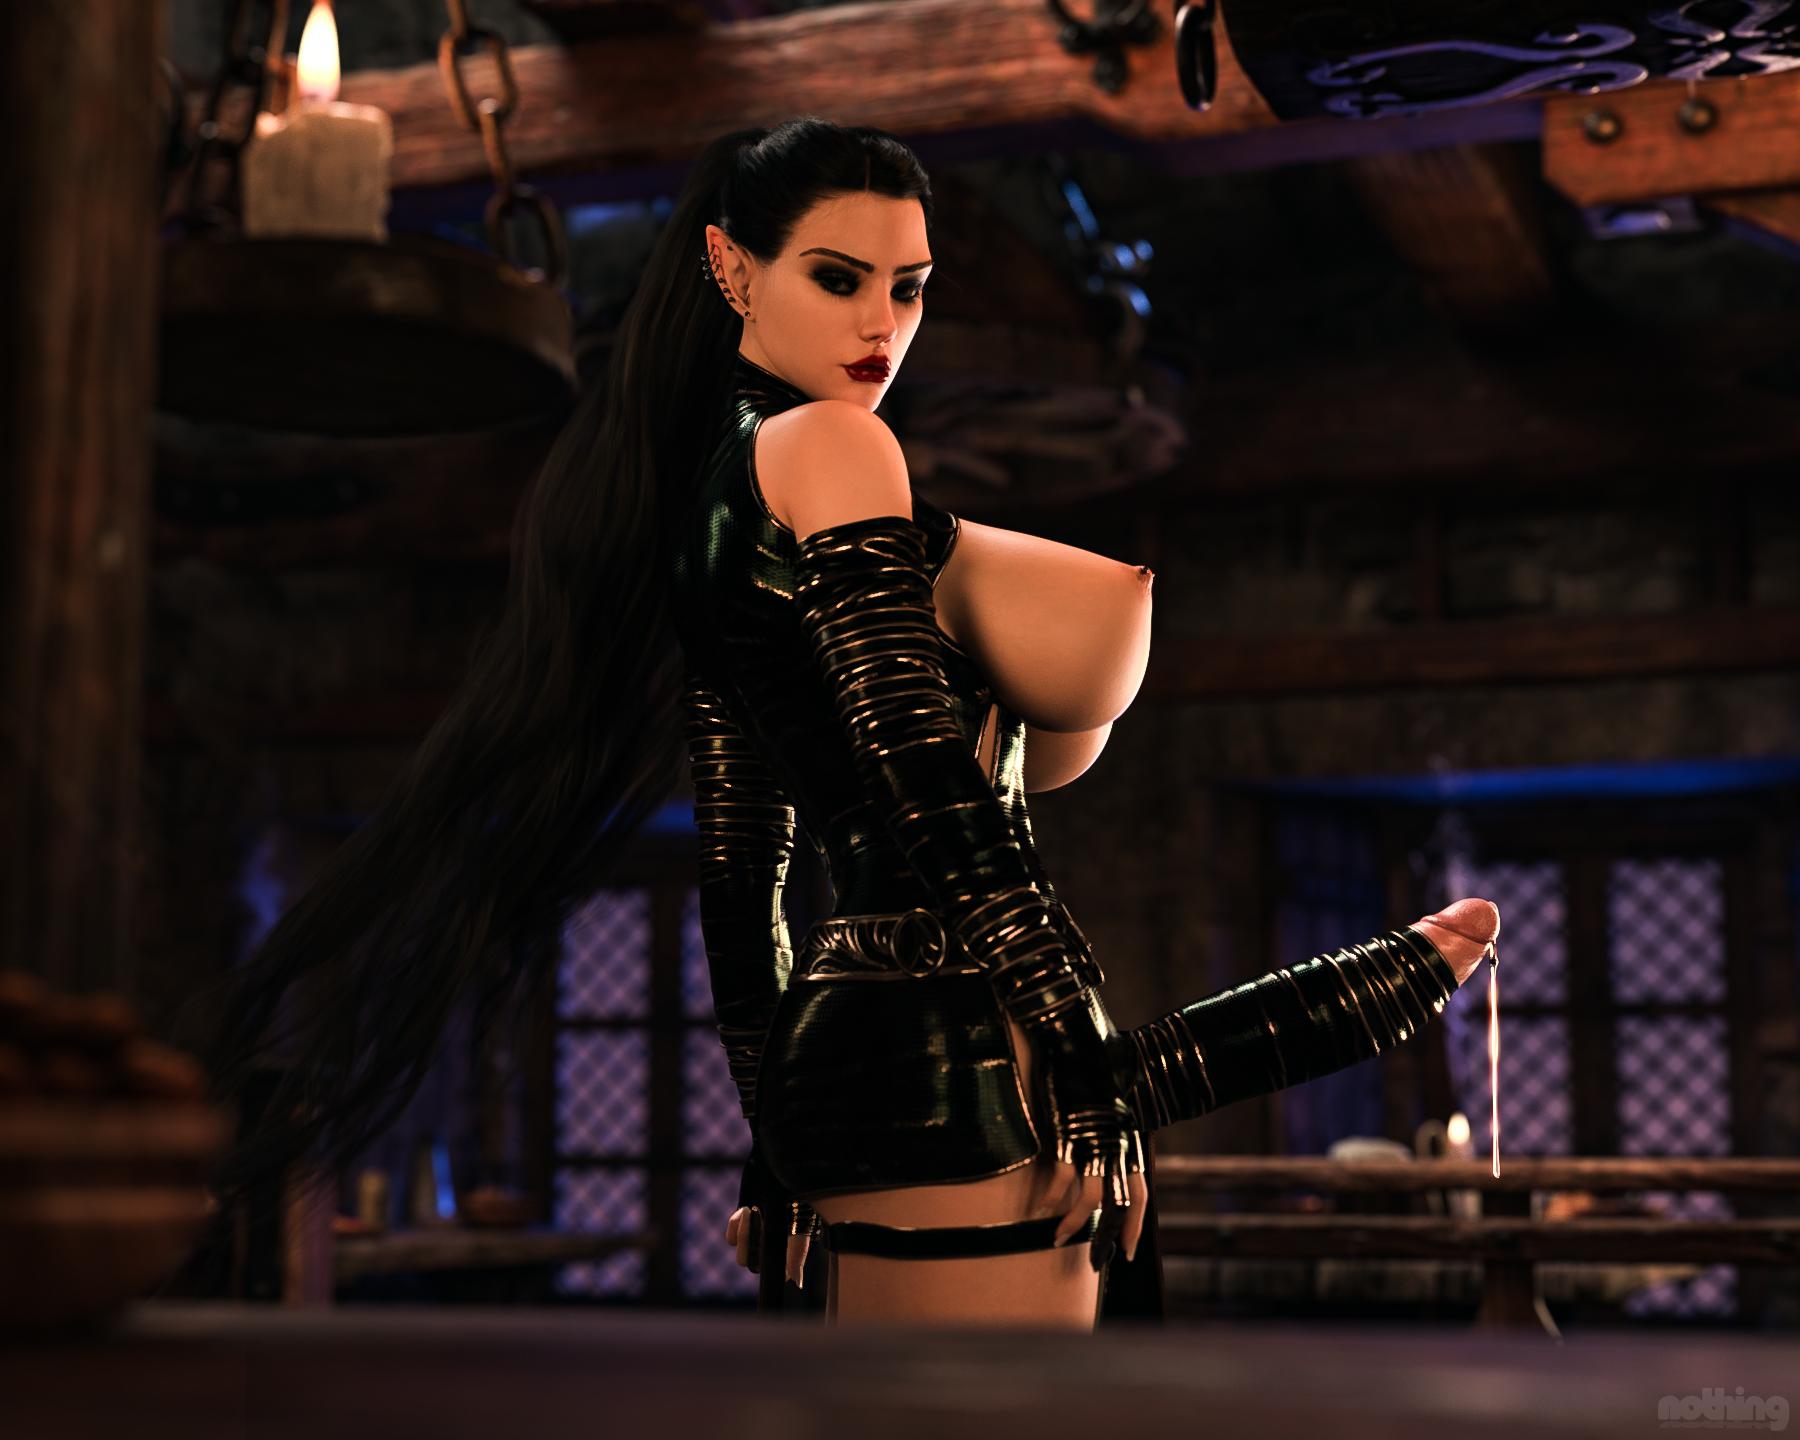 dark mistress elf thing